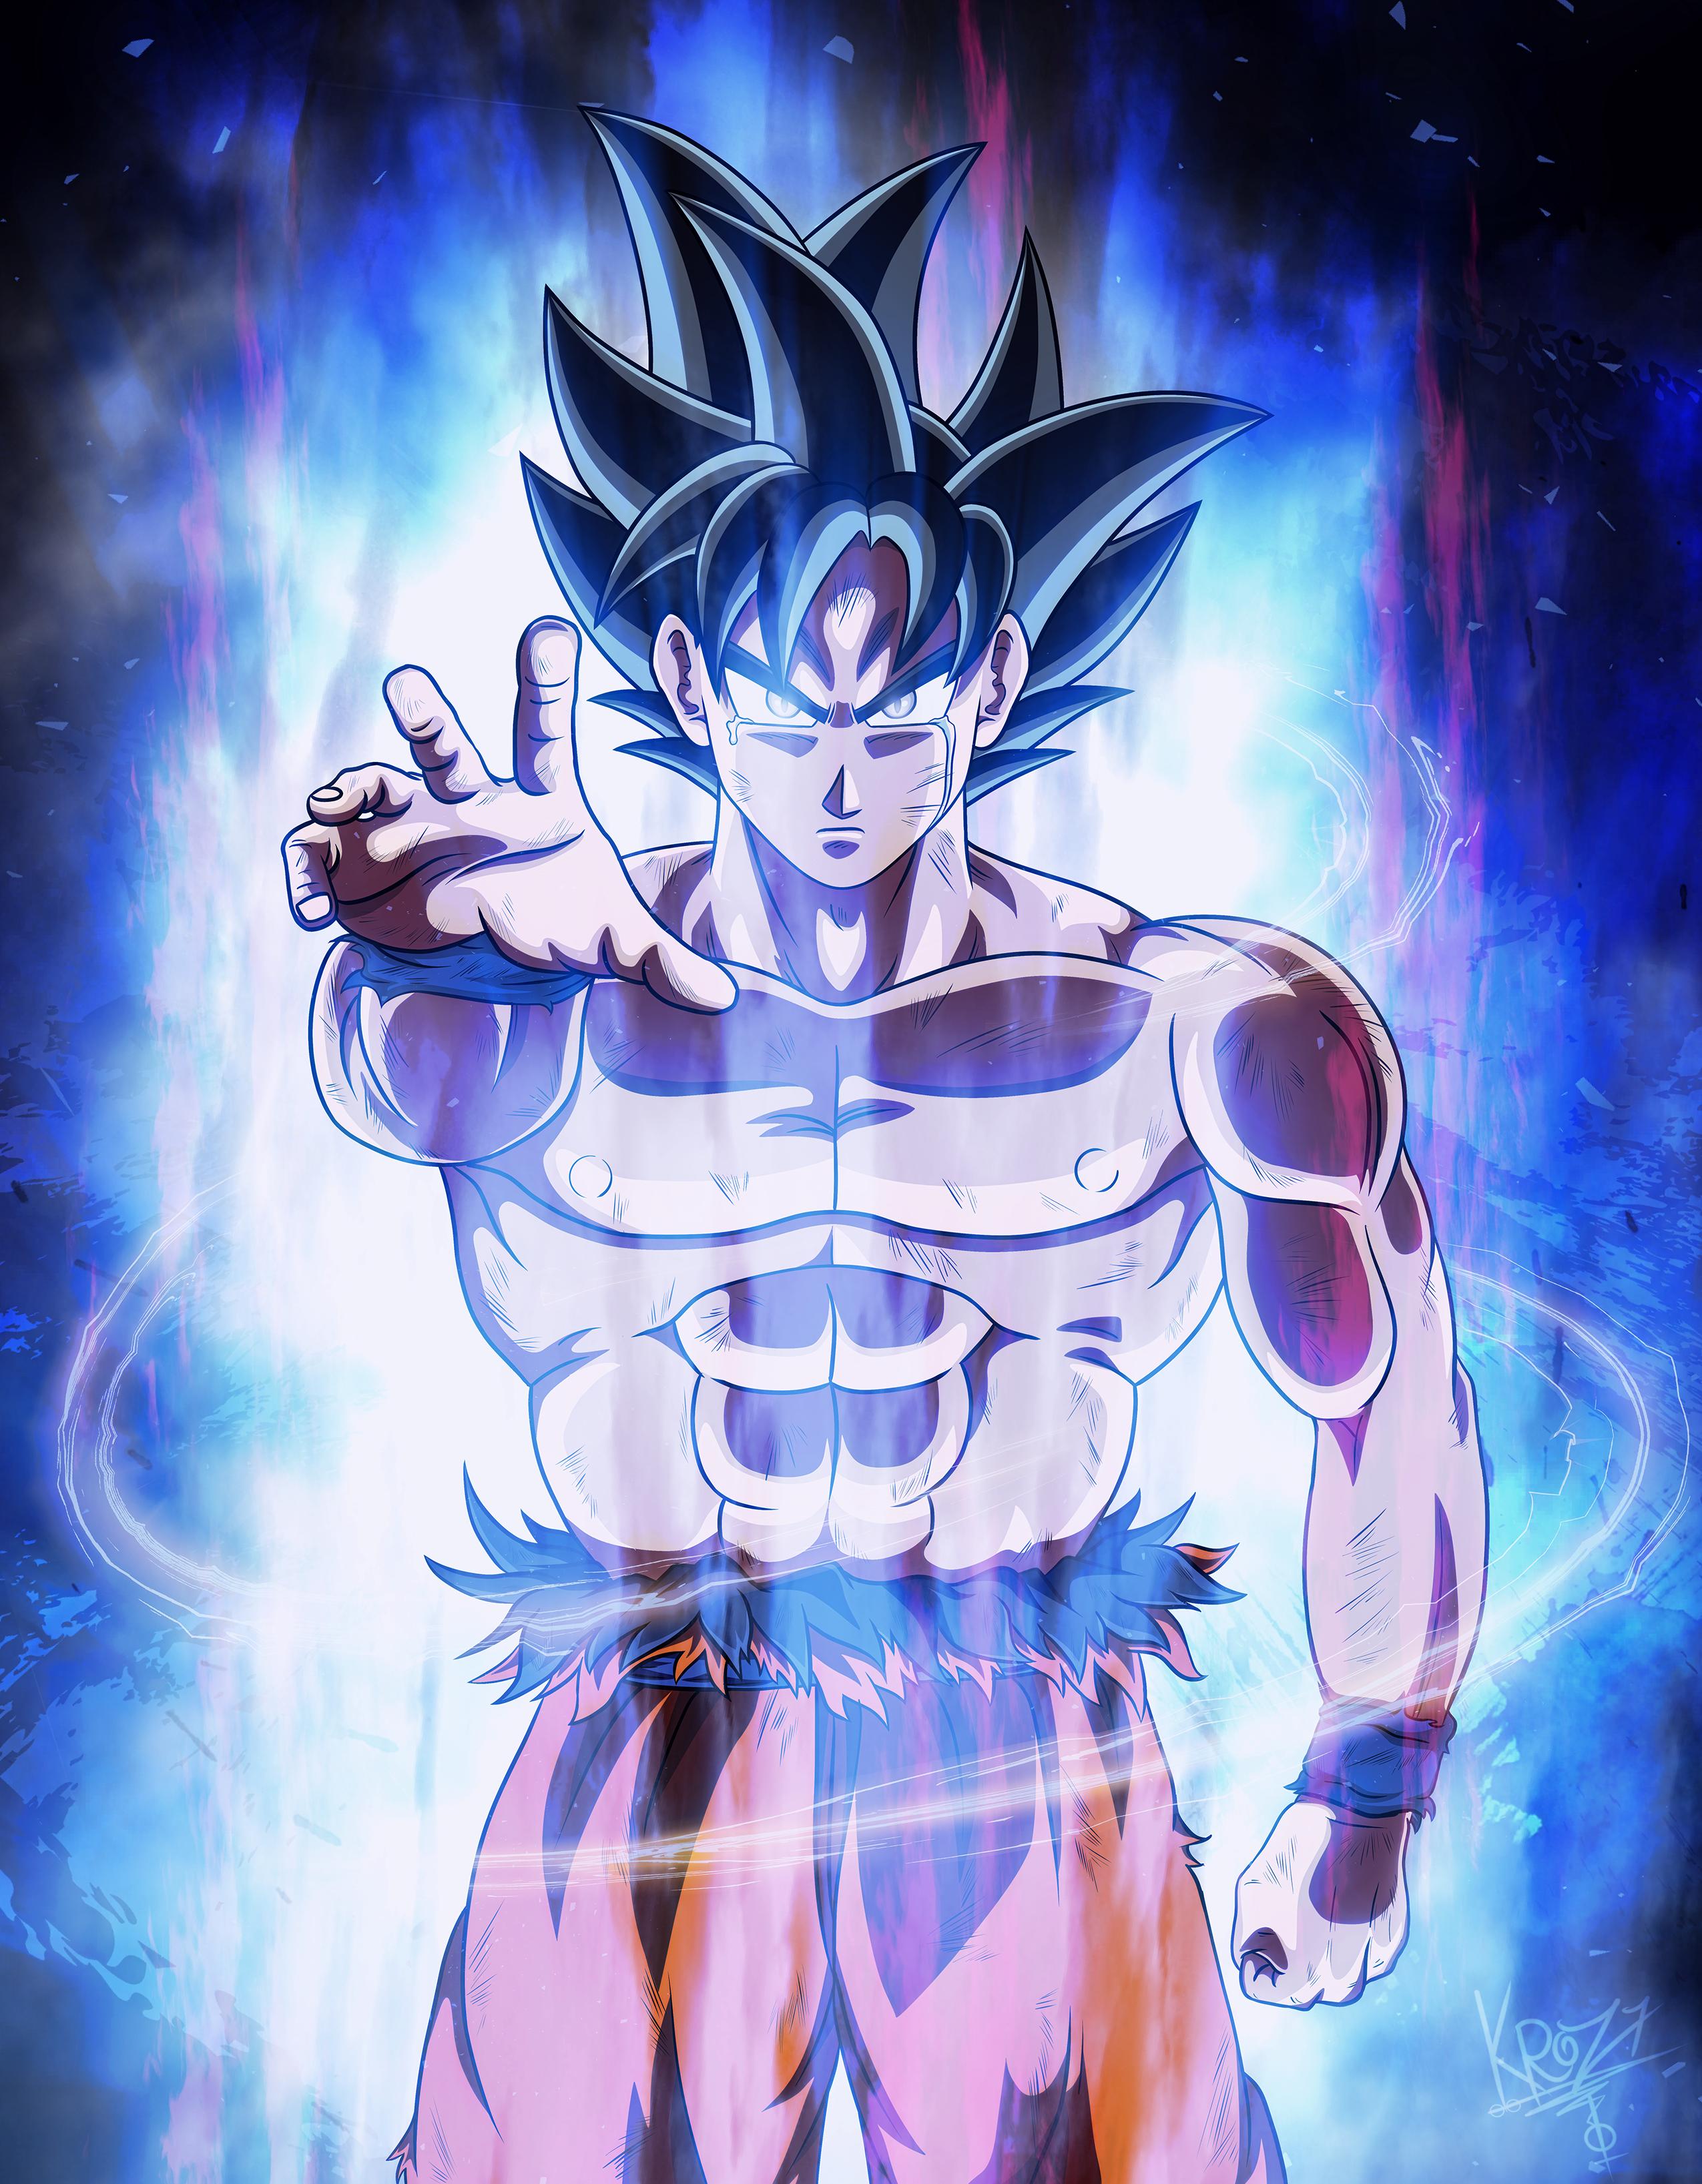 Goku Live Wallpaper Iphone 7 Plus Goku Ultra Instinto Goku Dragon Ball Dragon Y Dragon